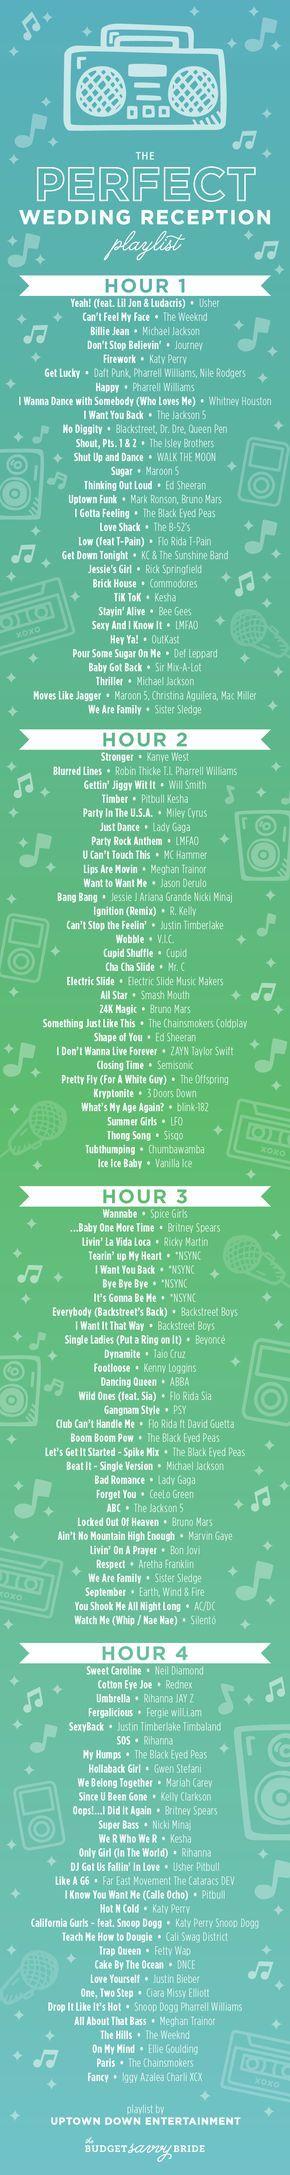 The Perfect Wedding Reception Playlist -- so epic!!!